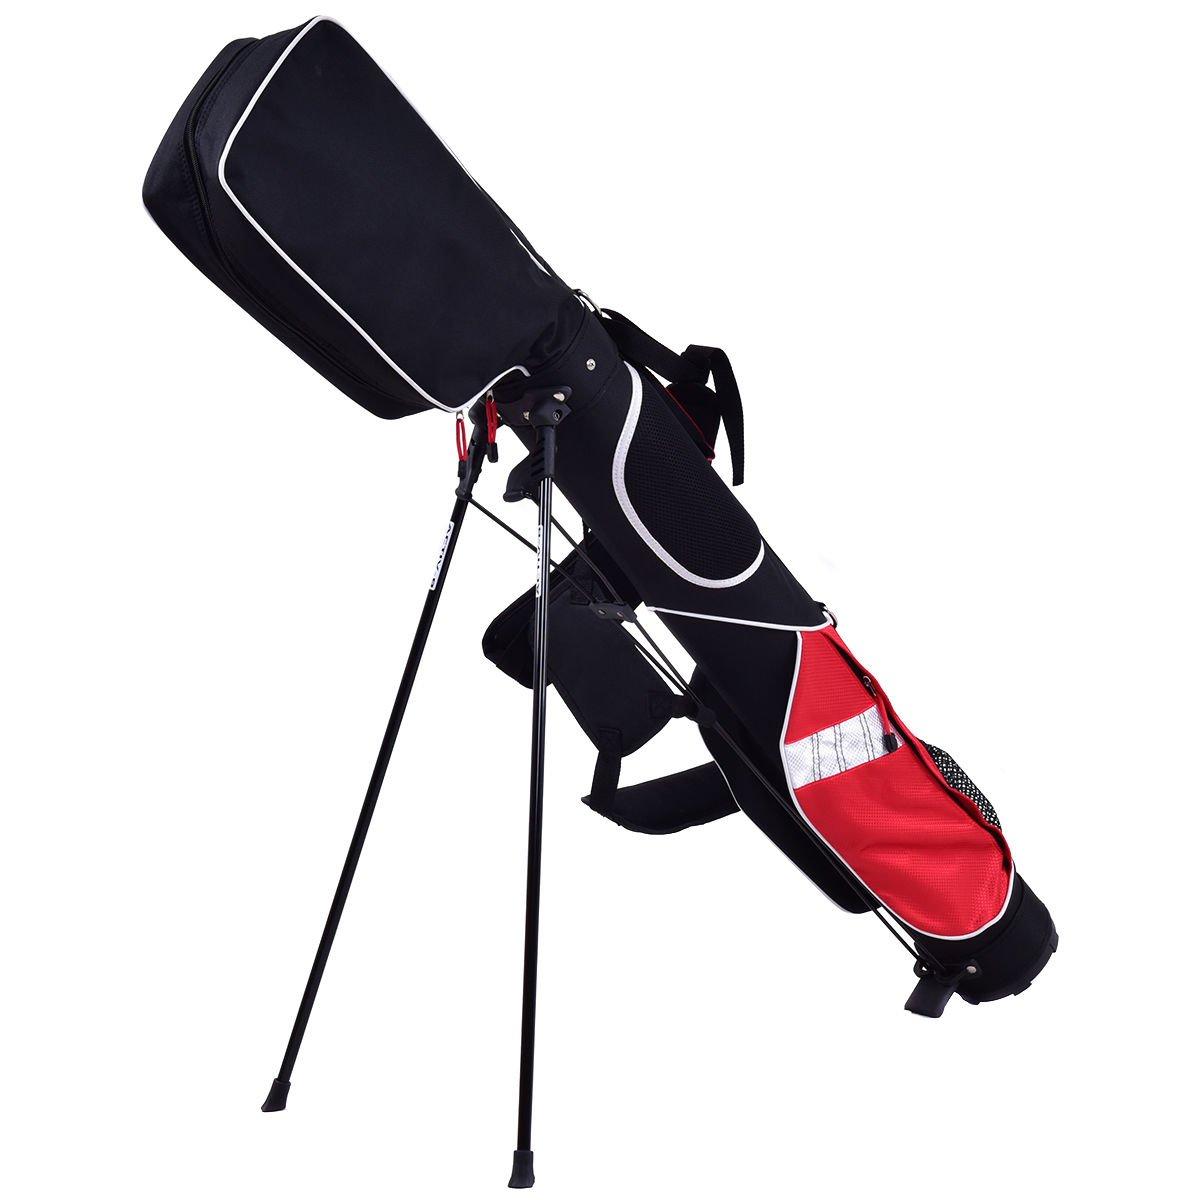 TANGKULA 5'' Golf Bag Club 7 Dividers Lightweight Carry Bag Golf Stand Bag by TANGKULA